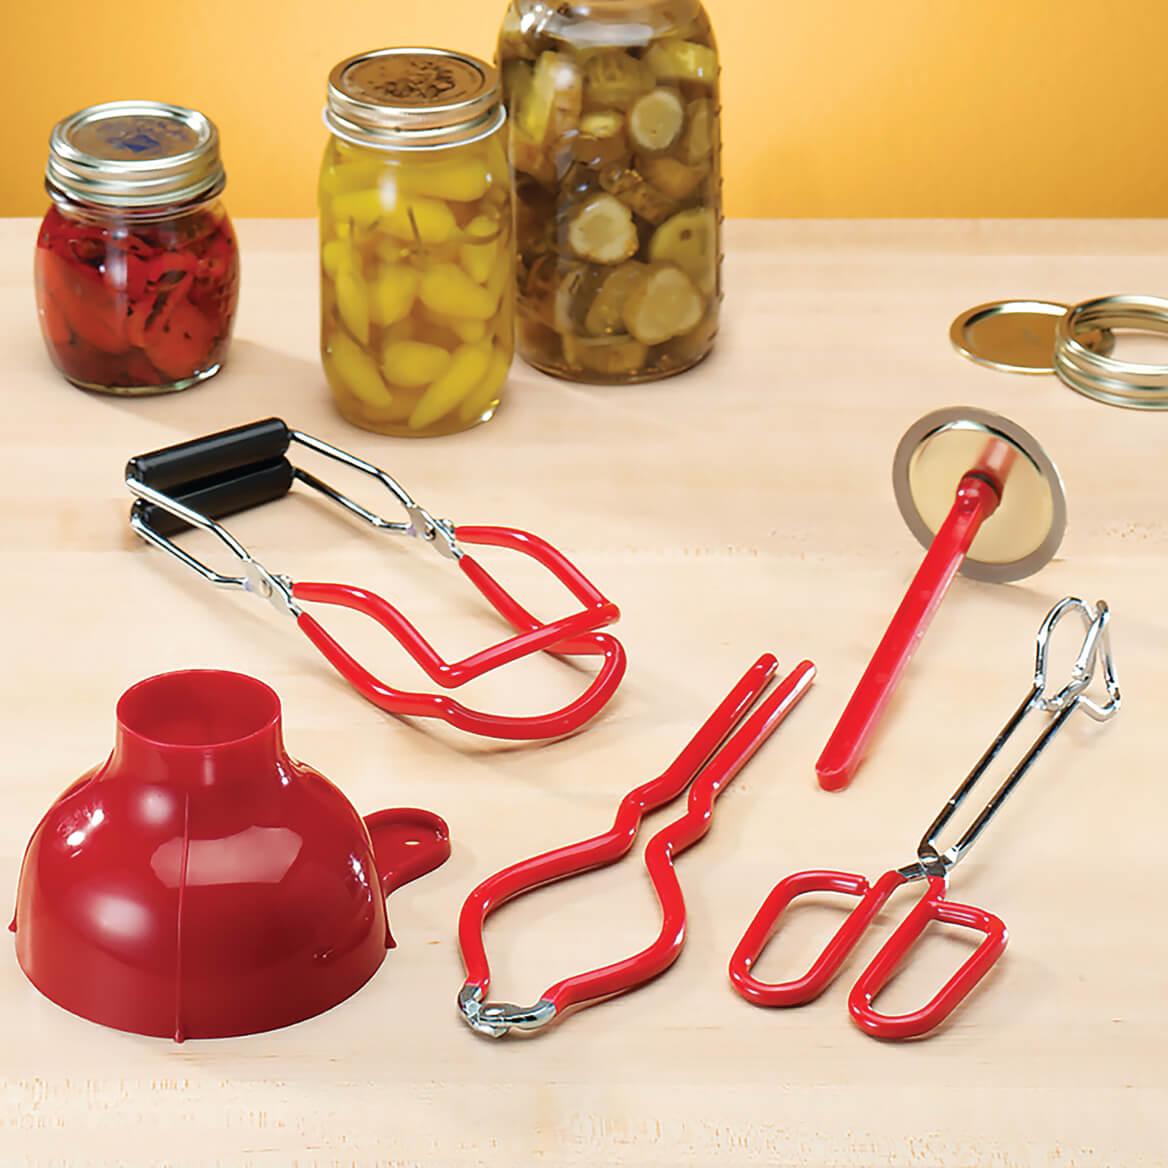 5 Piece Canning Set-371107